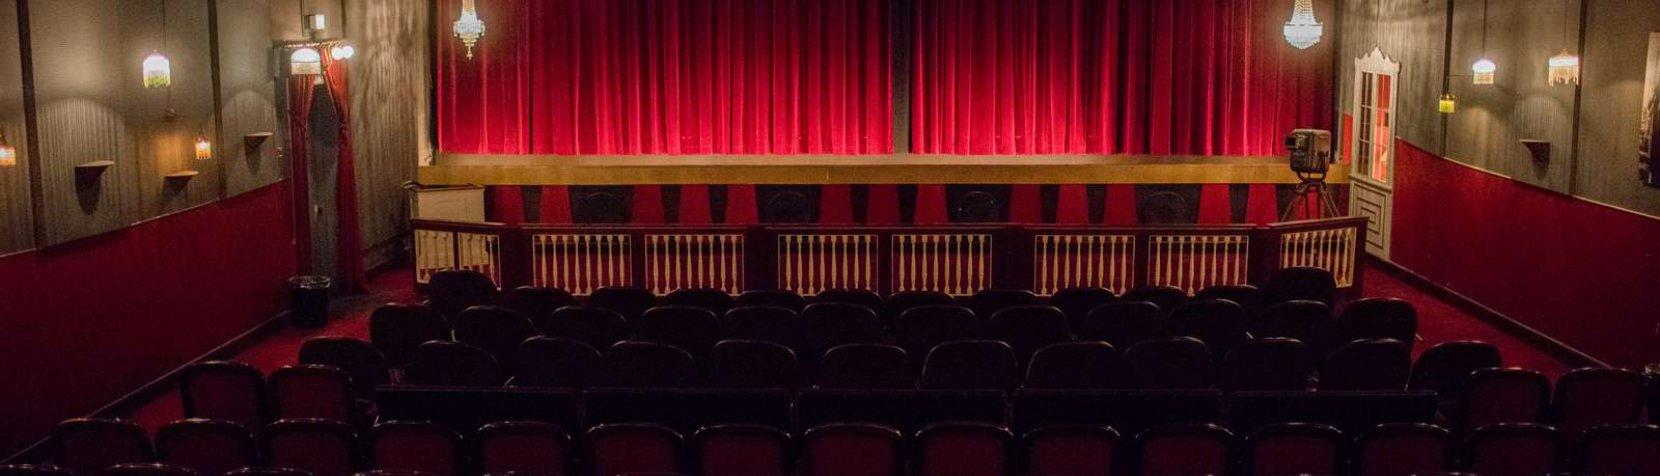 Foto: Reprise Teatret - salen